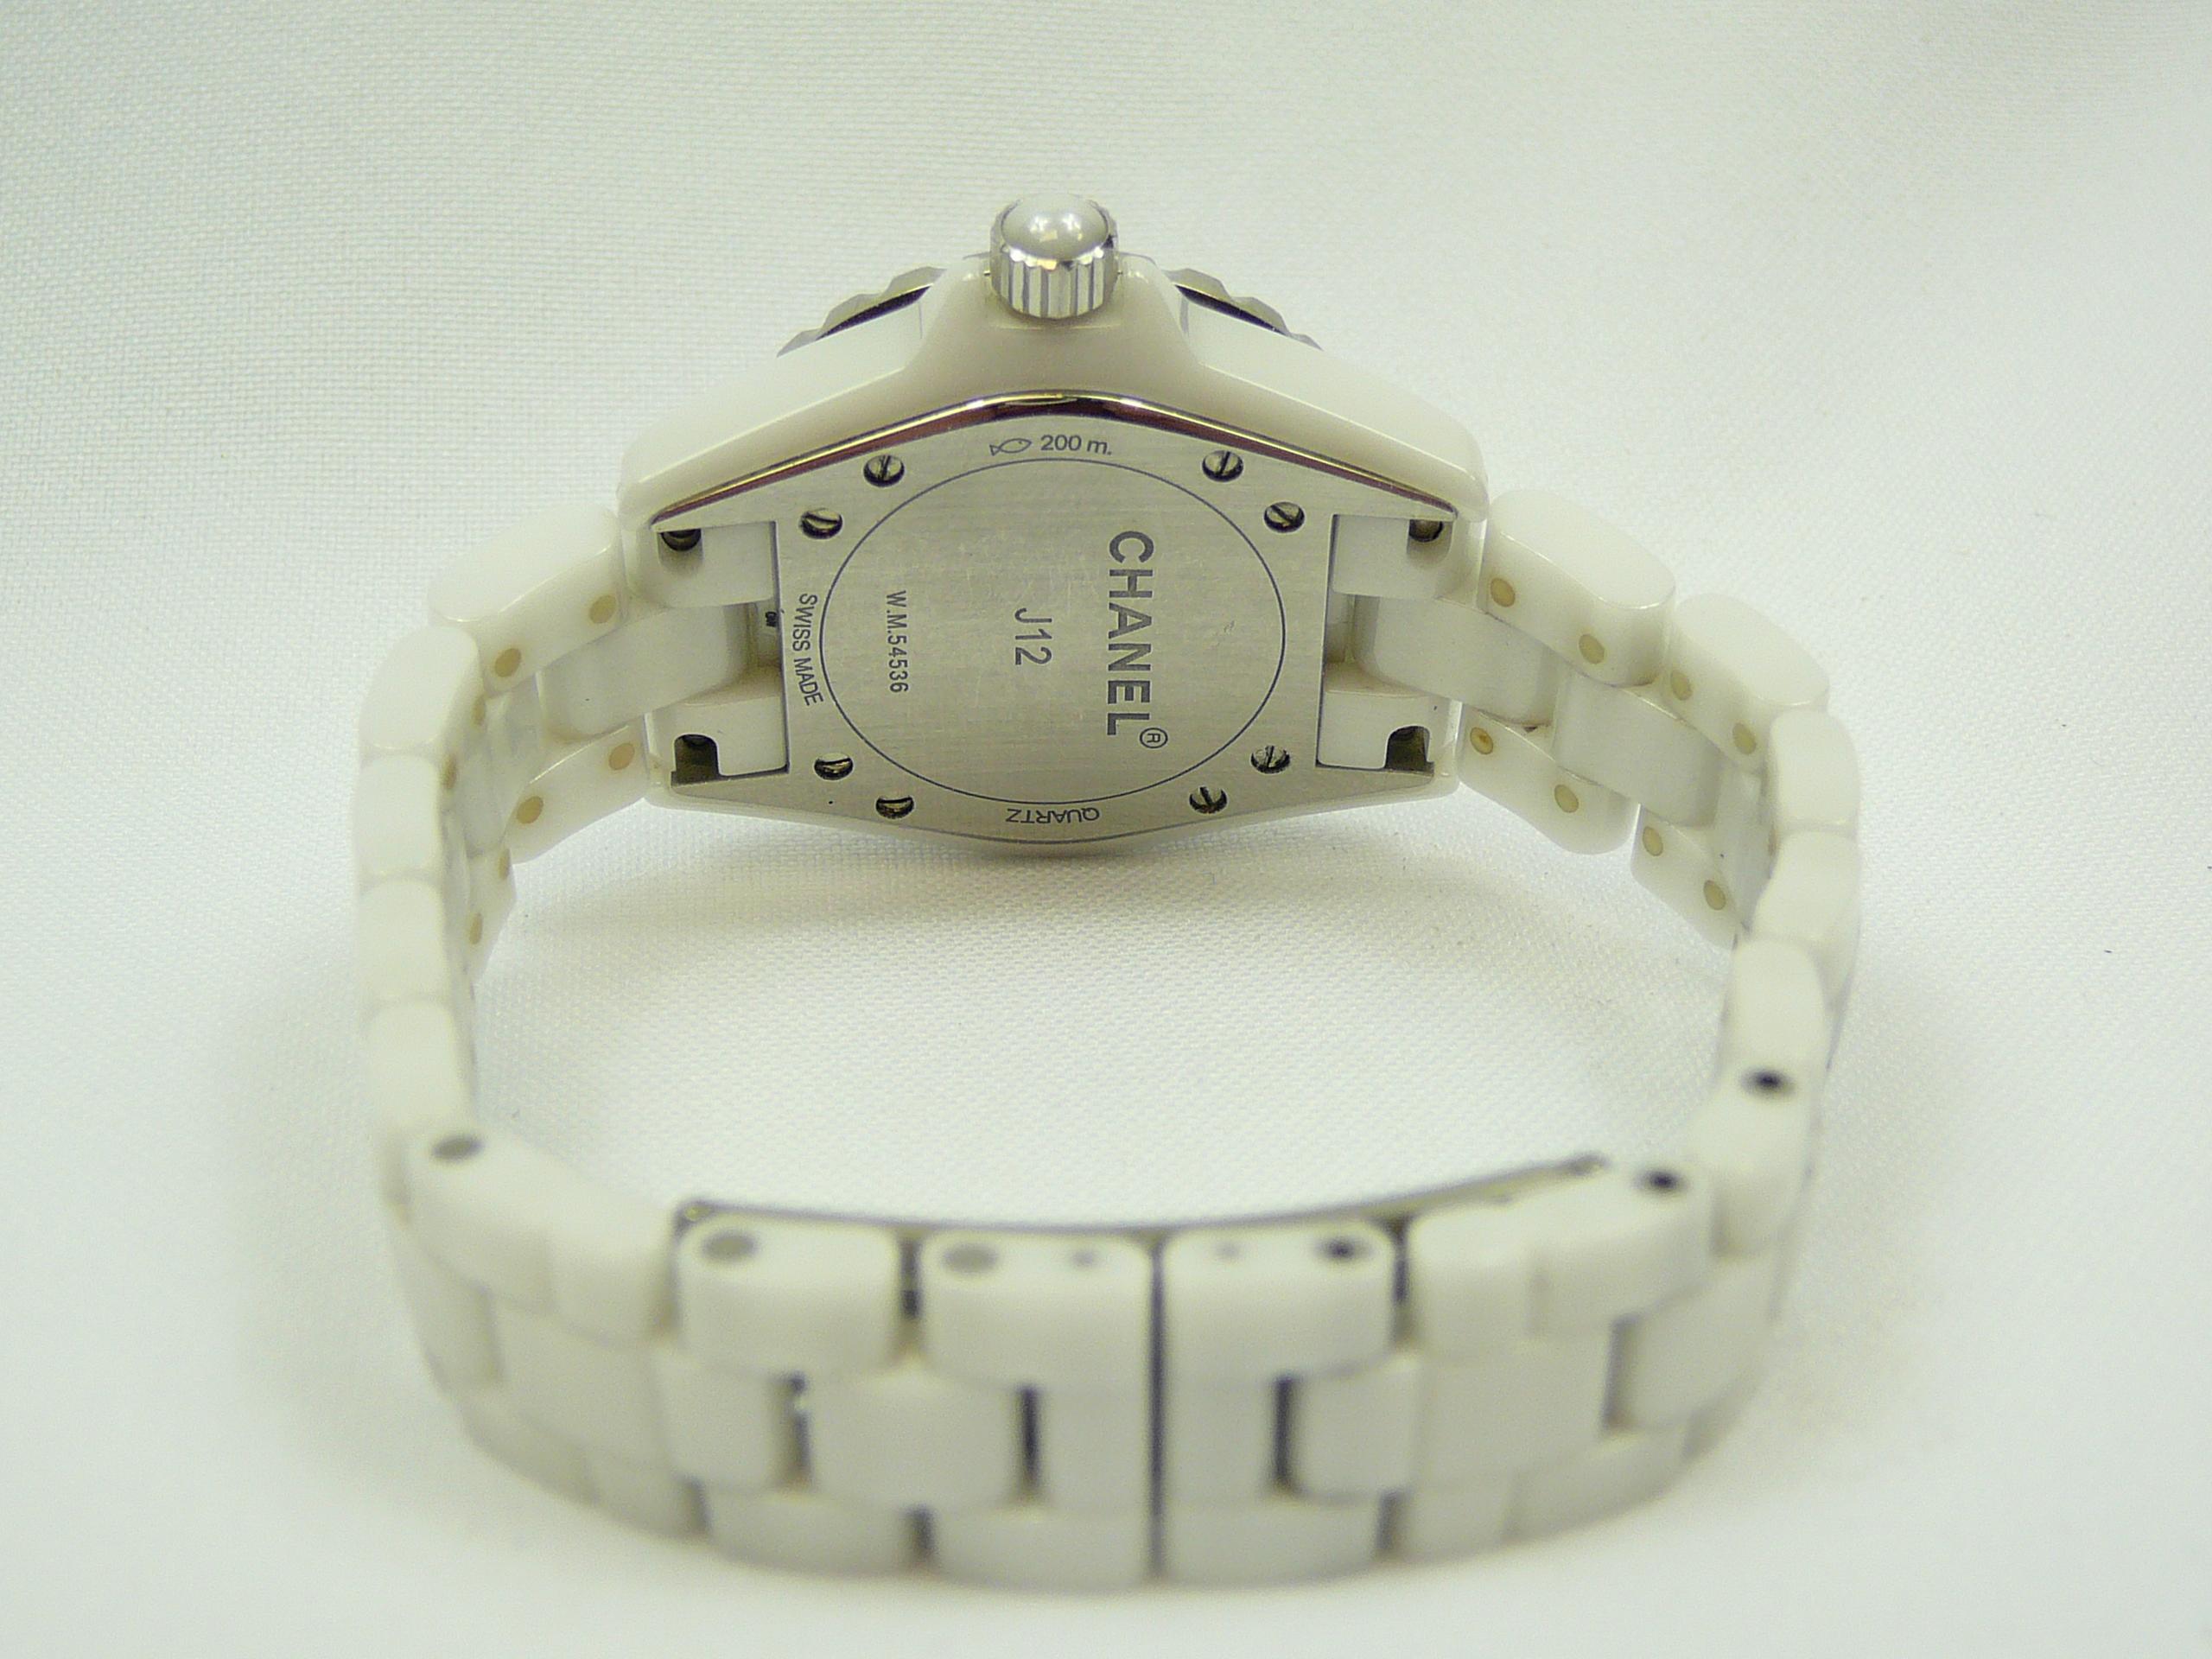 Ladies Chanel J12 Wrist Watch - Image 3 of 3